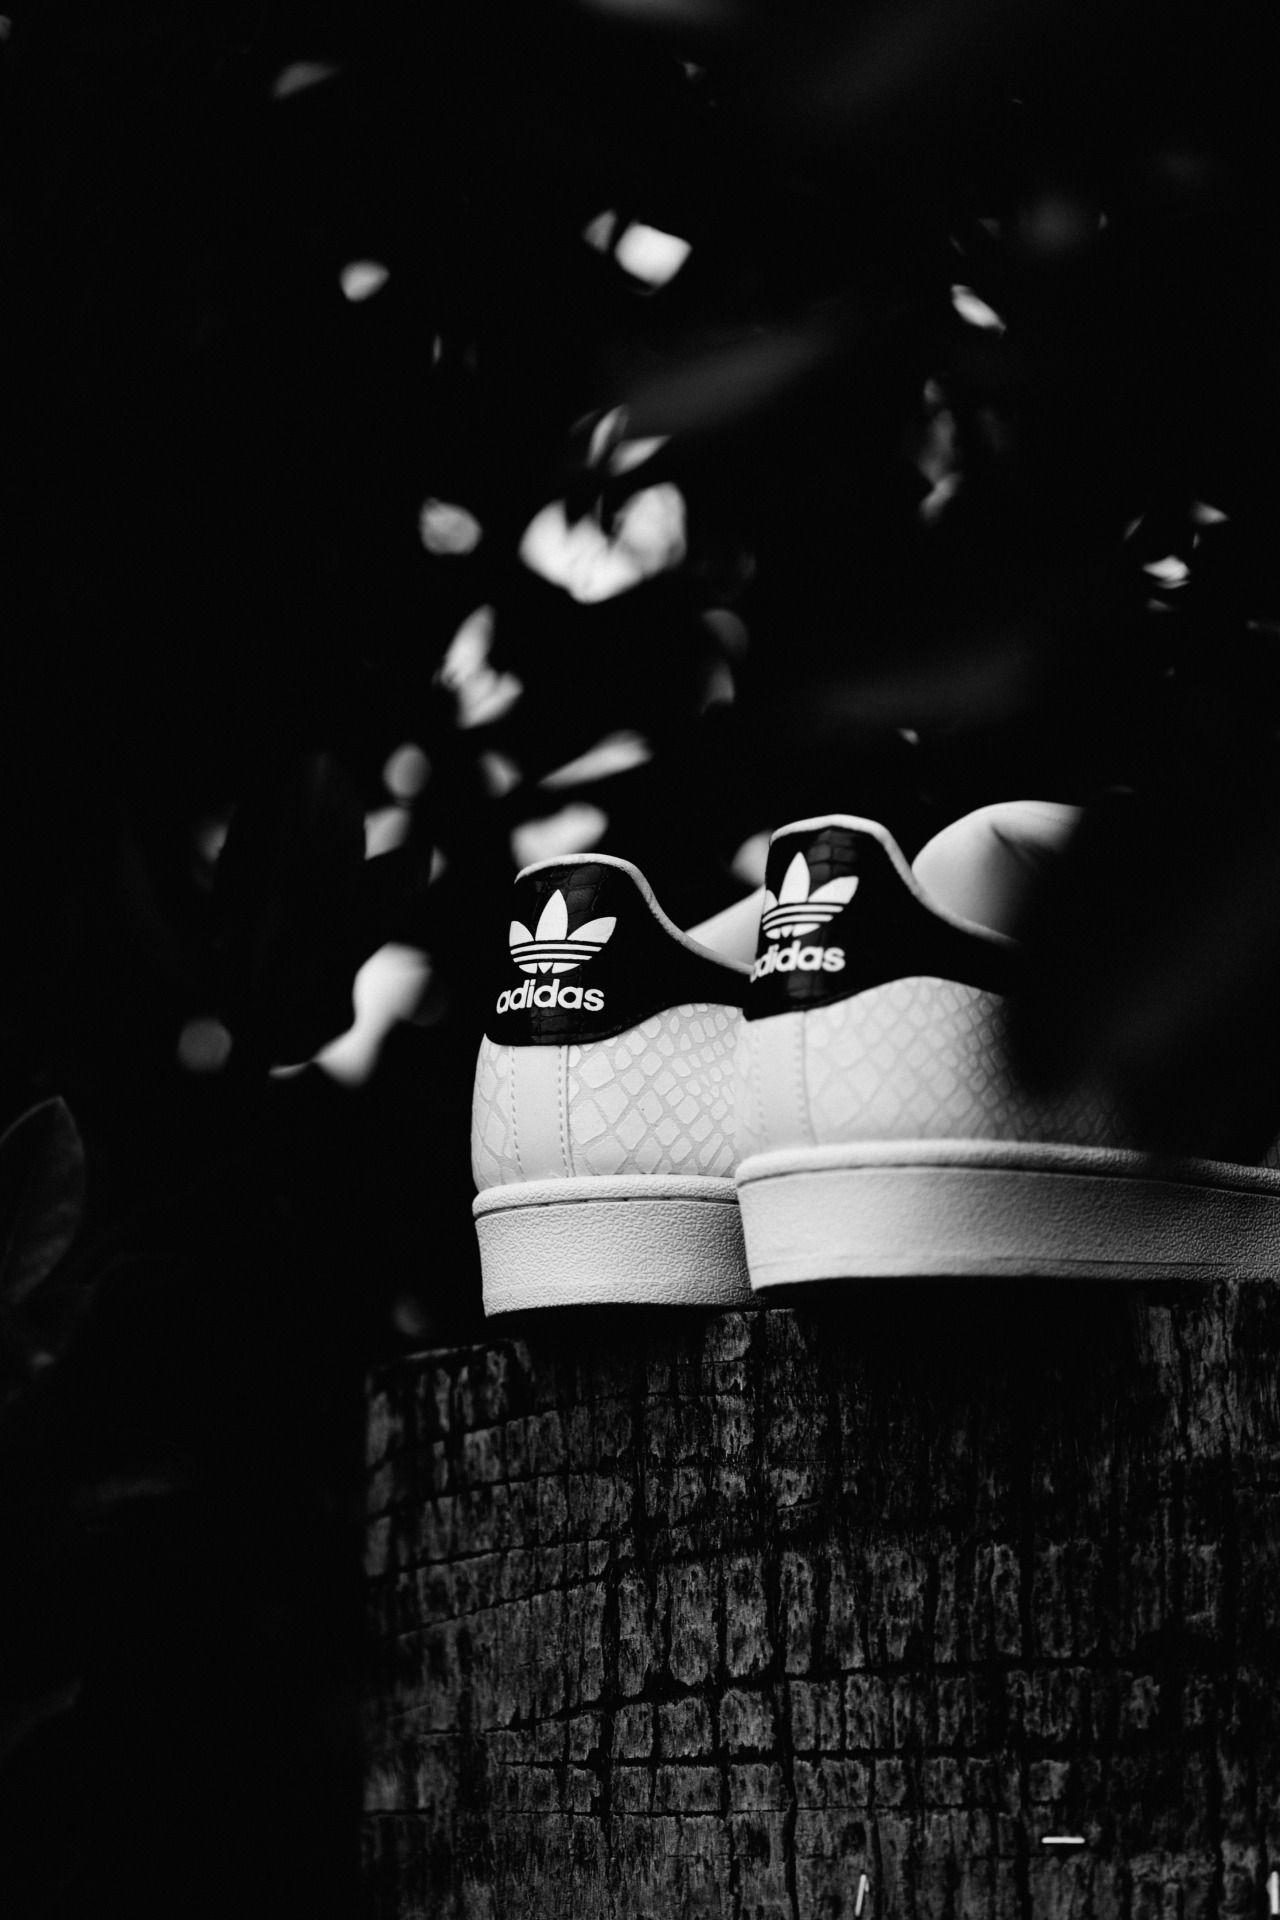 Adidas Originals Embossed Snakeskin Superstarwww.featuresneakerboutique.comPhotographer: @FreakinFrancis